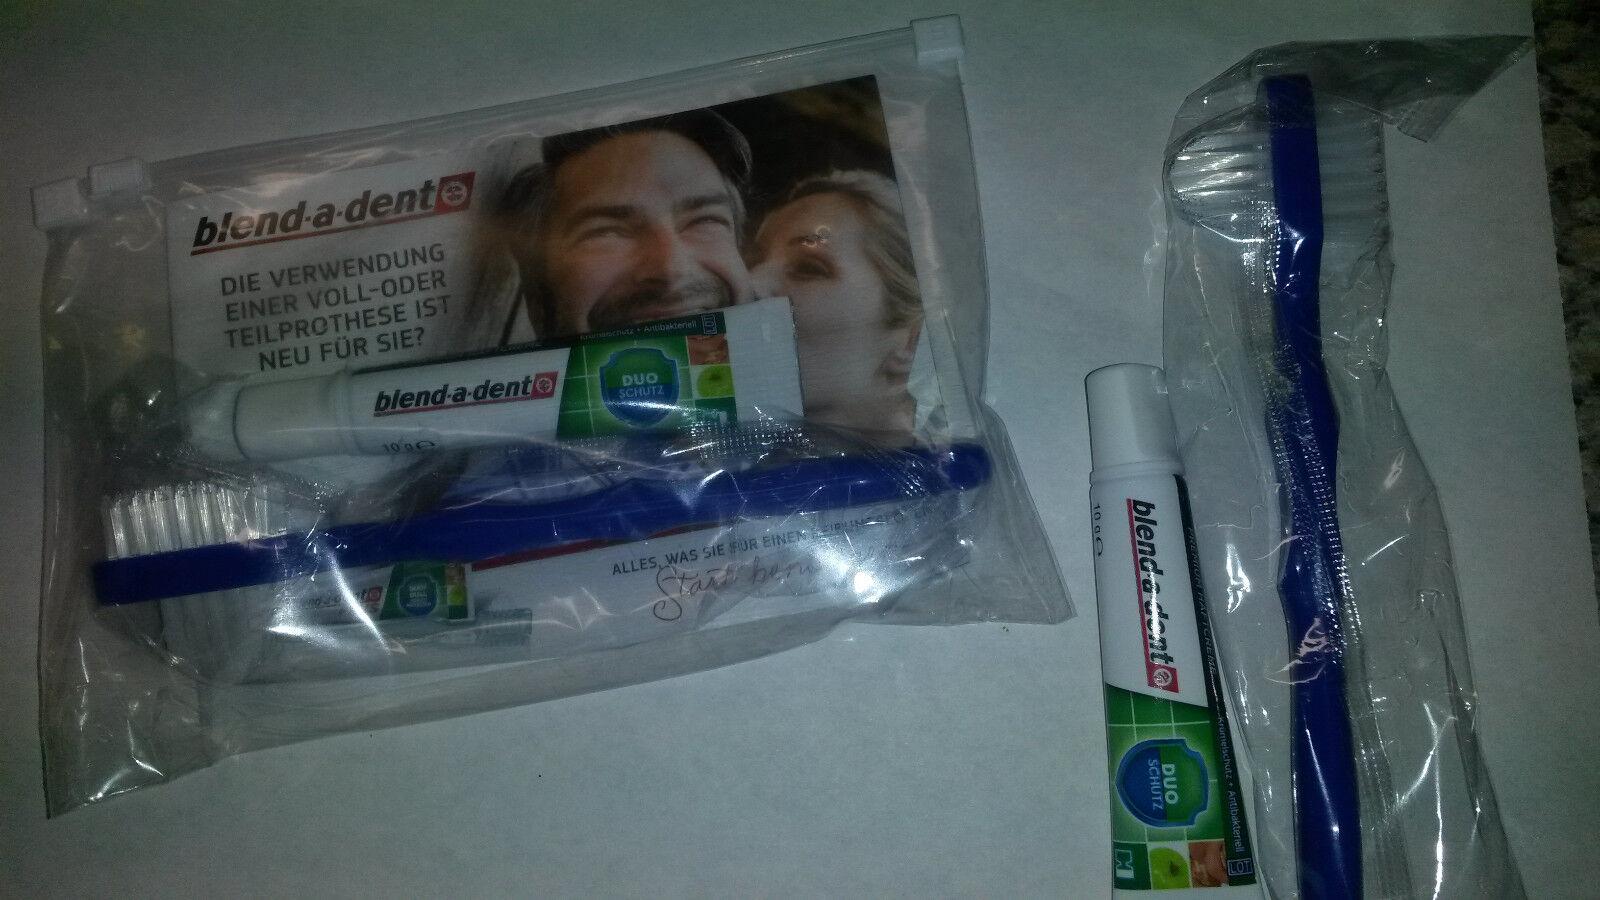 blend-a-dent Duo Schutz Prothesenhaftcreme 10g, Reiseset, Oral-B Prothesenbürste